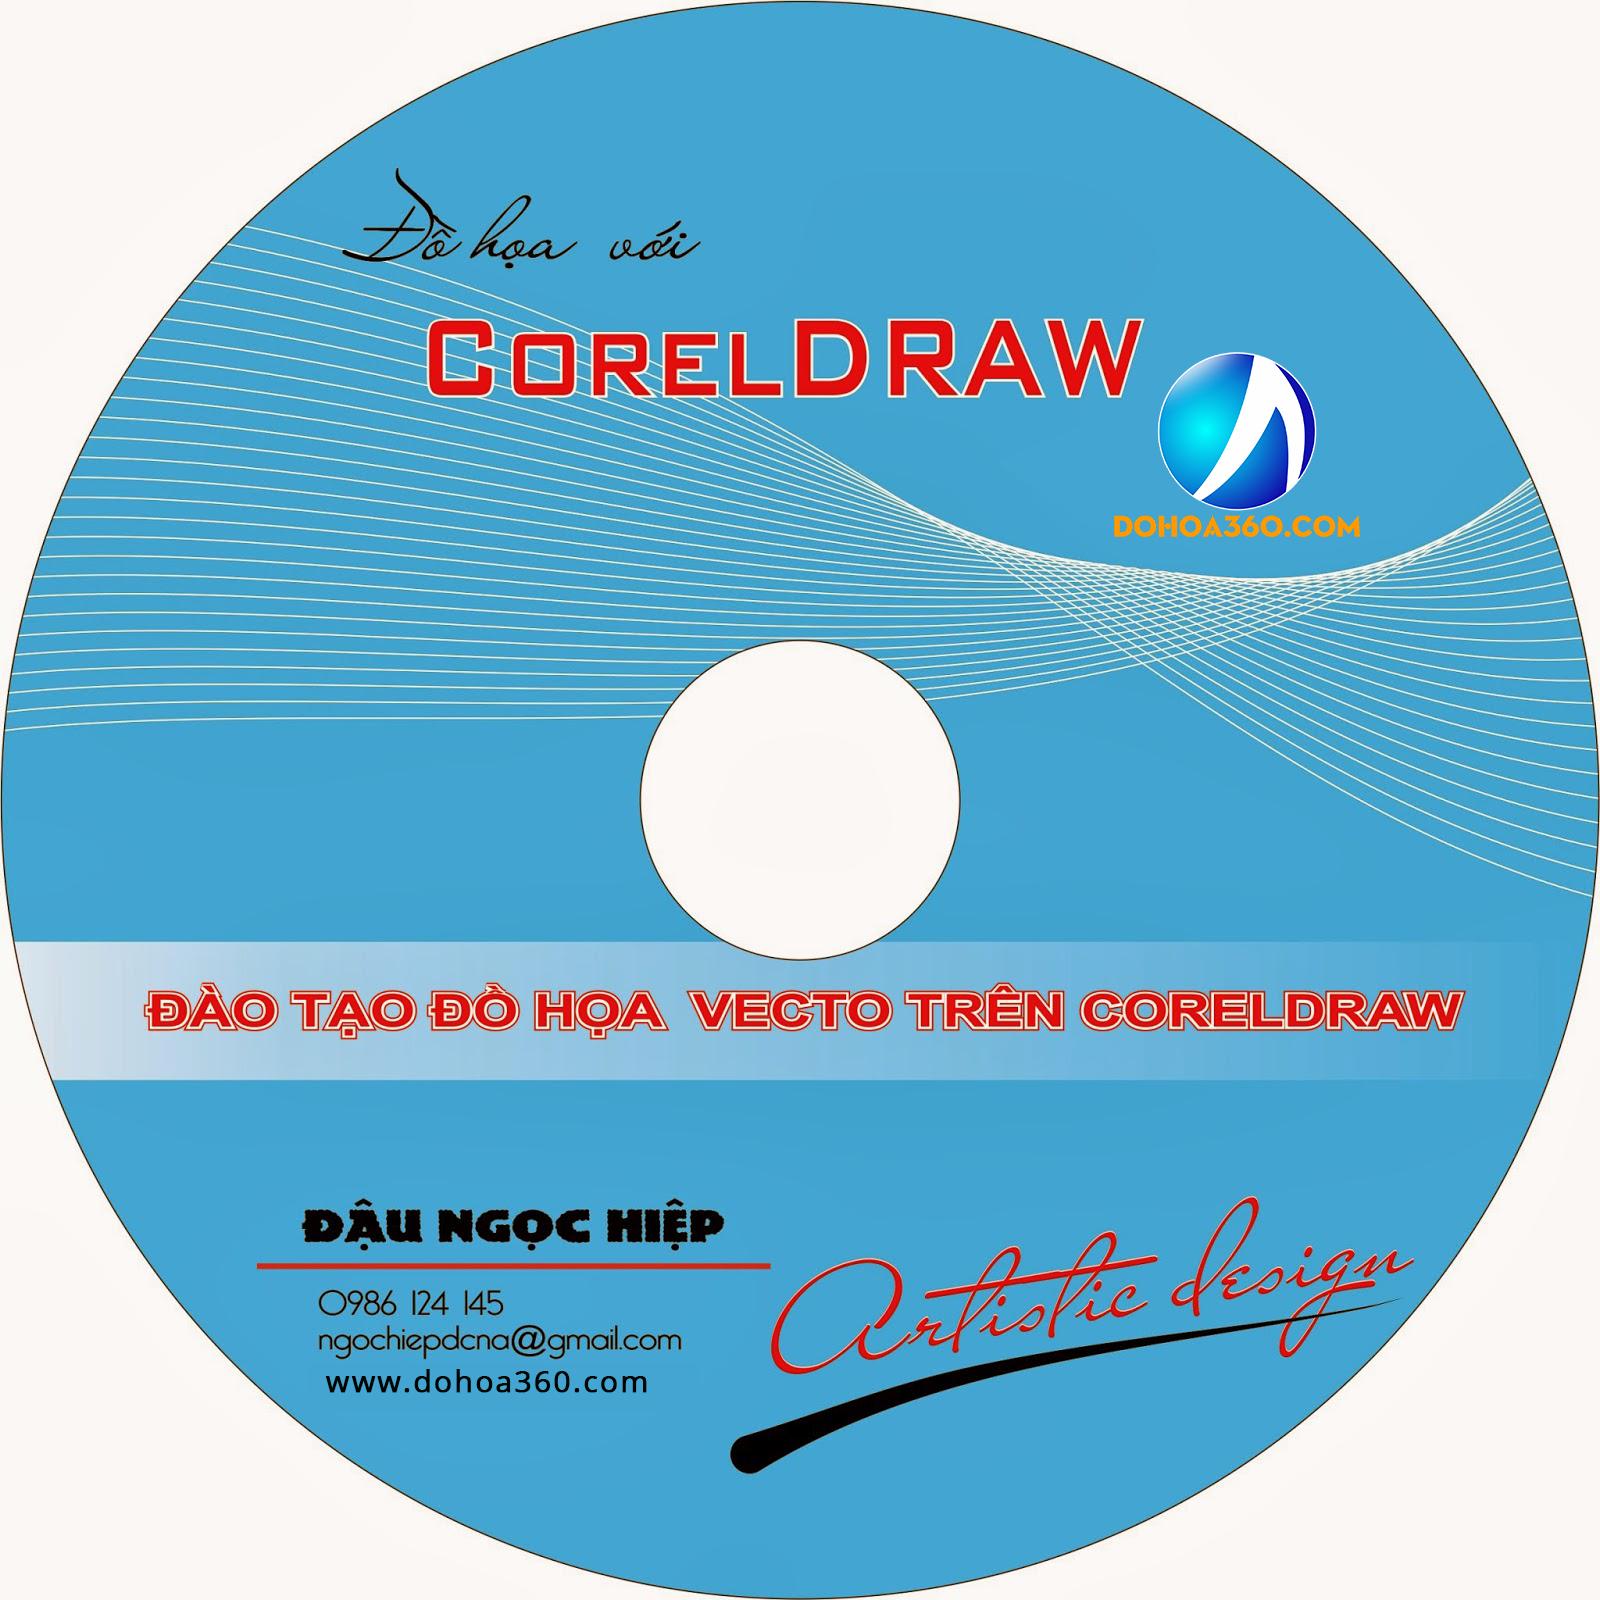 Thiết kế quảng cáo trên CorelDRAW